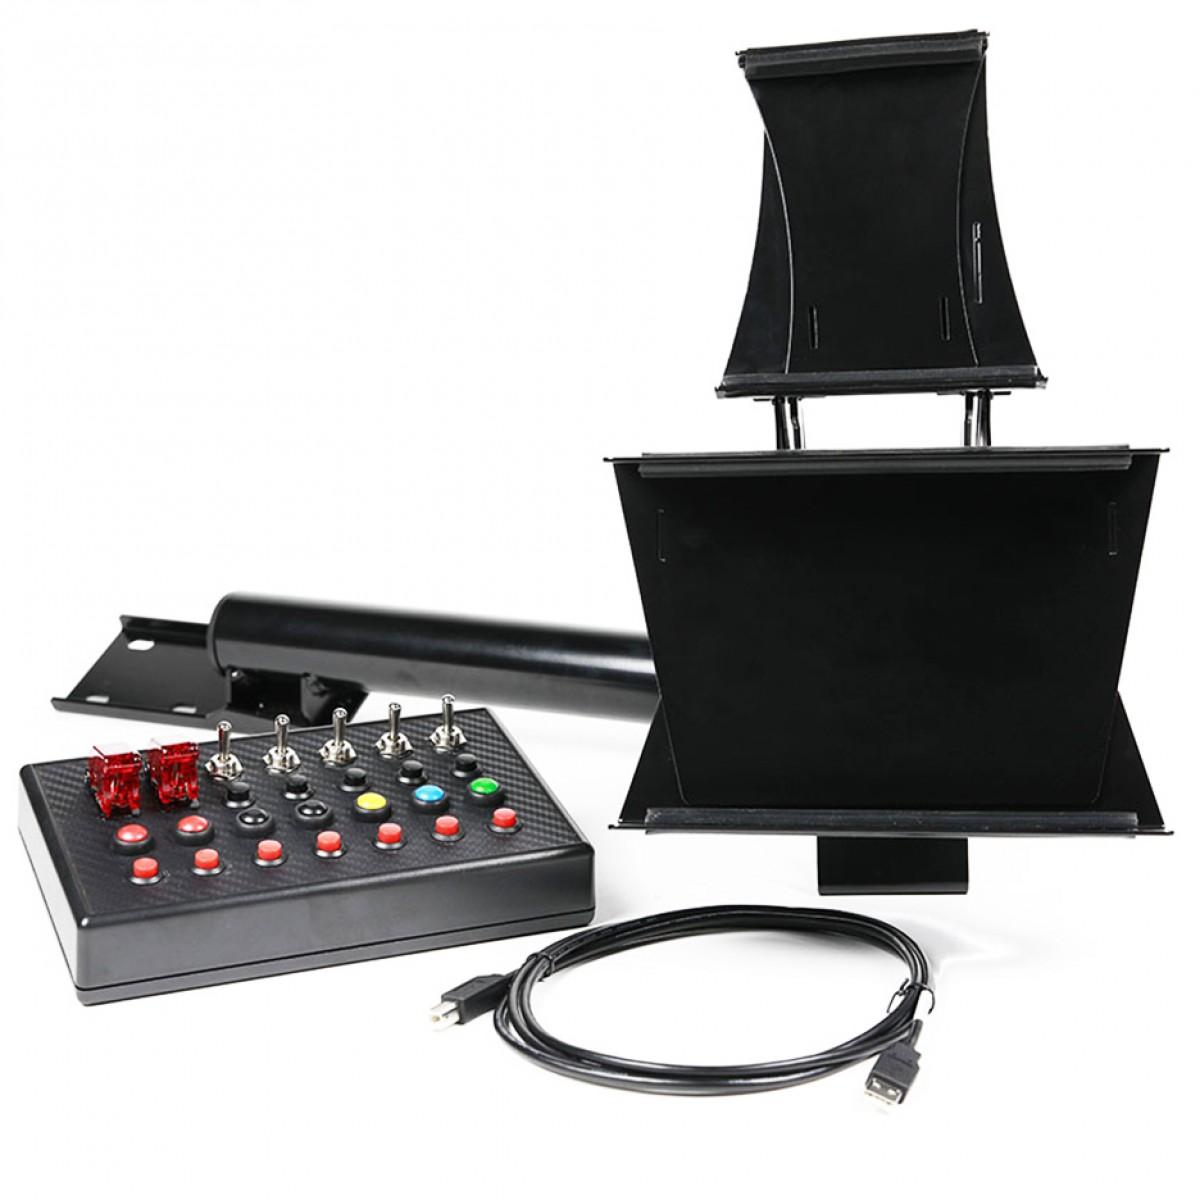 Bundle N1/S1 Buttonbox Upgrade Kit + DSD Track Boss + USB